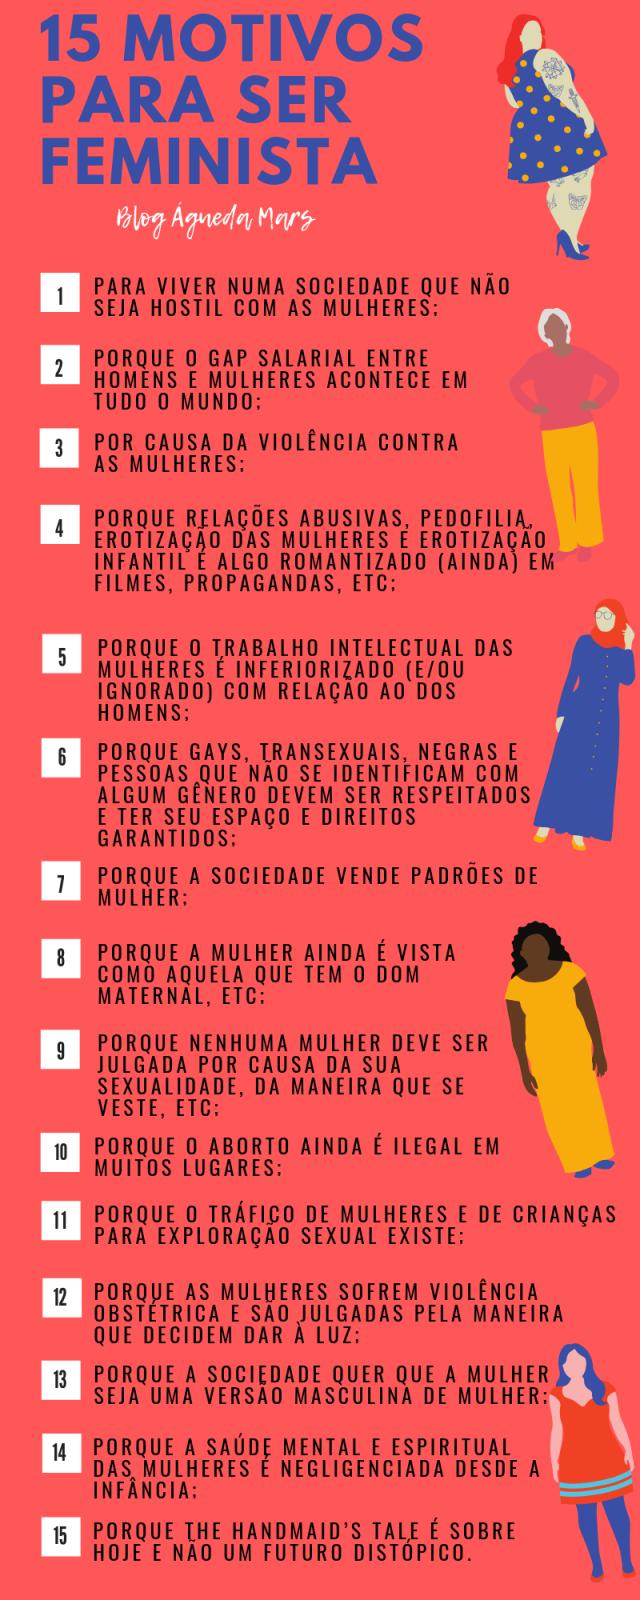 15 MOTIVOS PARA SER FEMINISTA